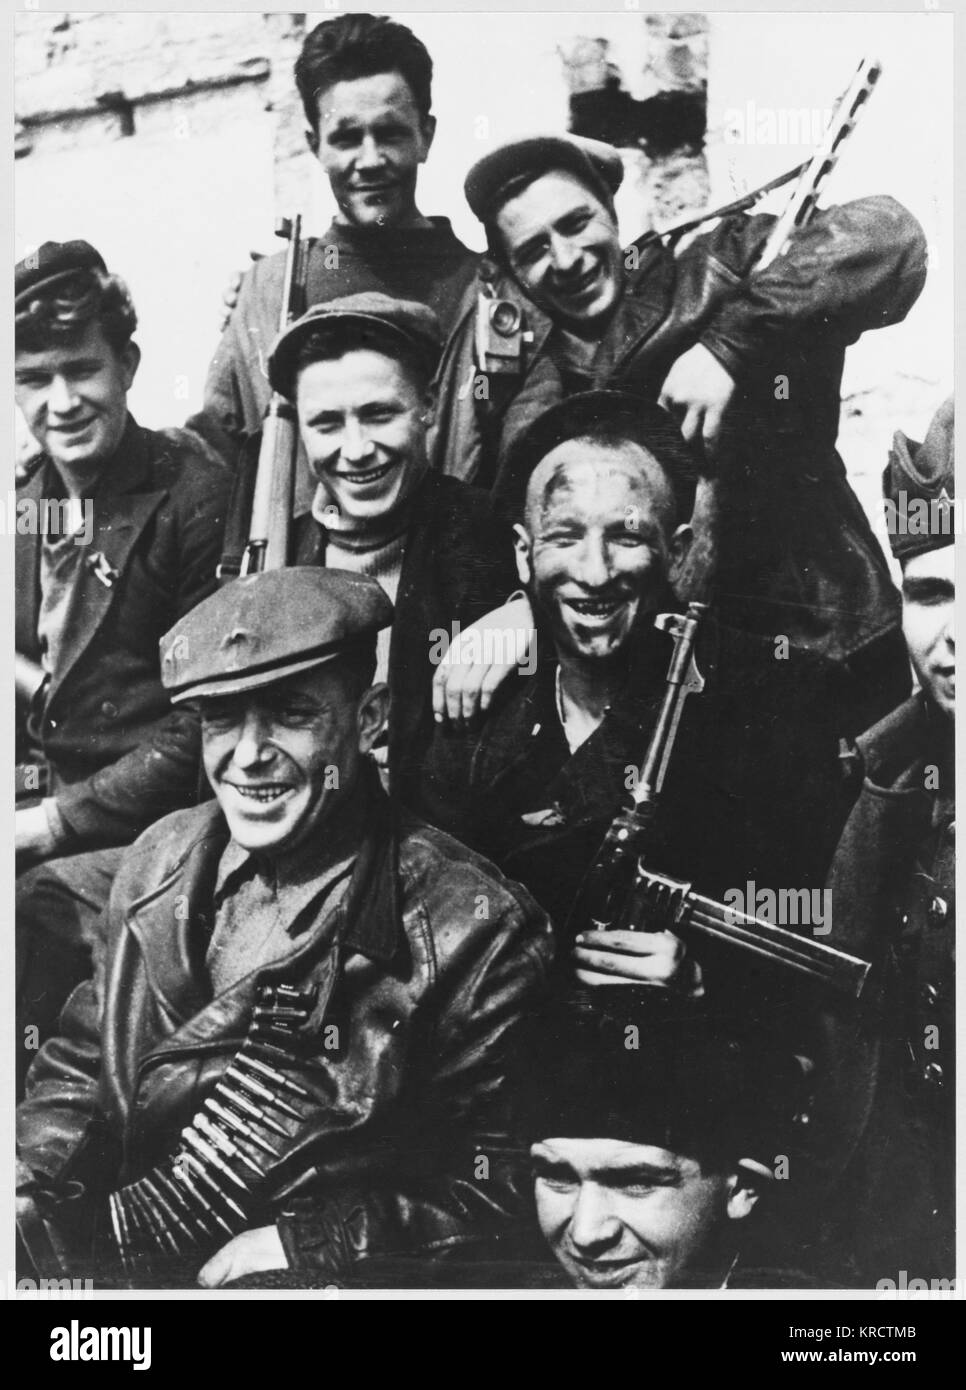 A group of cheerful Soviet Partisans at Odessa, on the Black Sea coast of Ukraine. - Stock Image